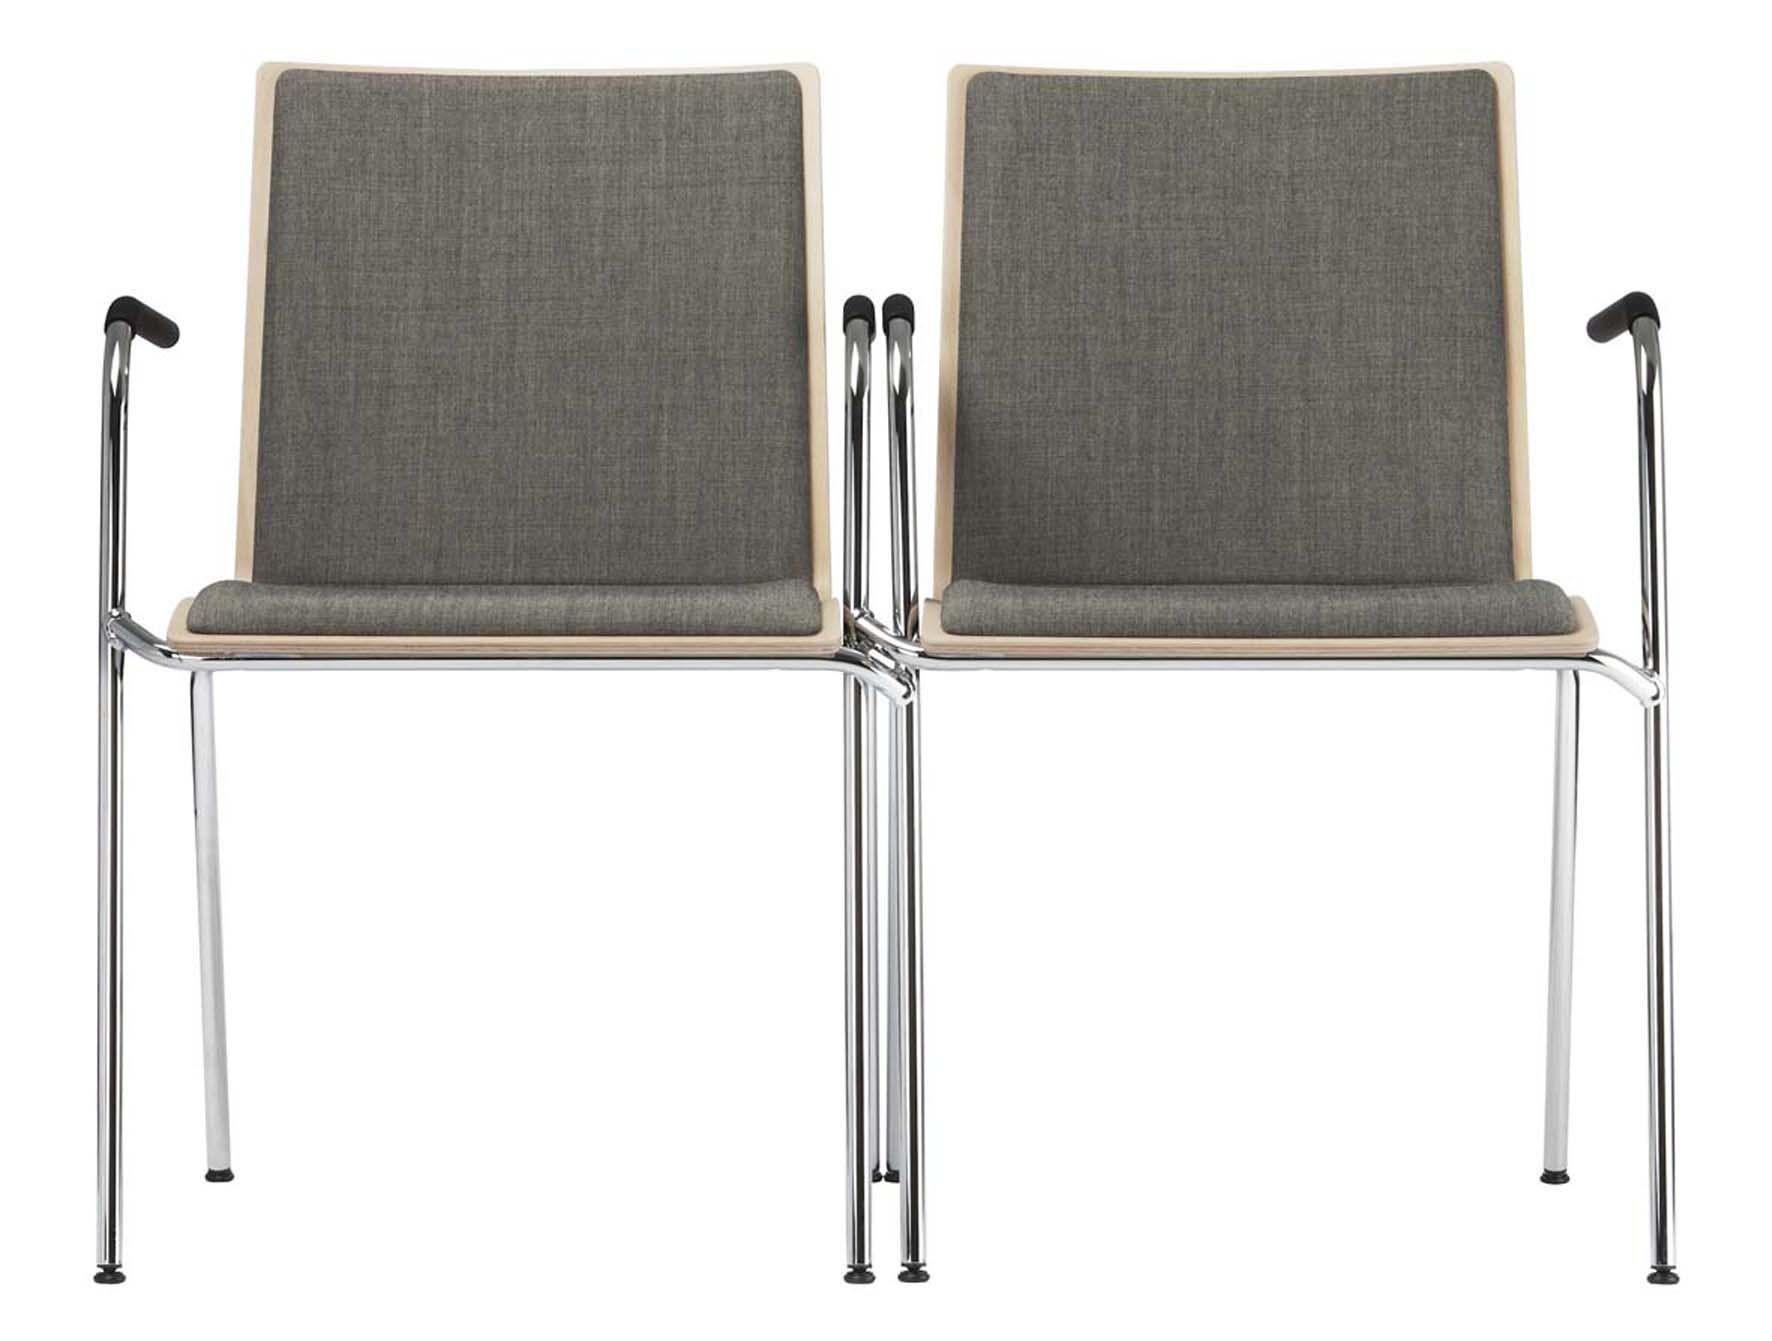 Thonet S 160 by Delphin Design - interlocking public seating